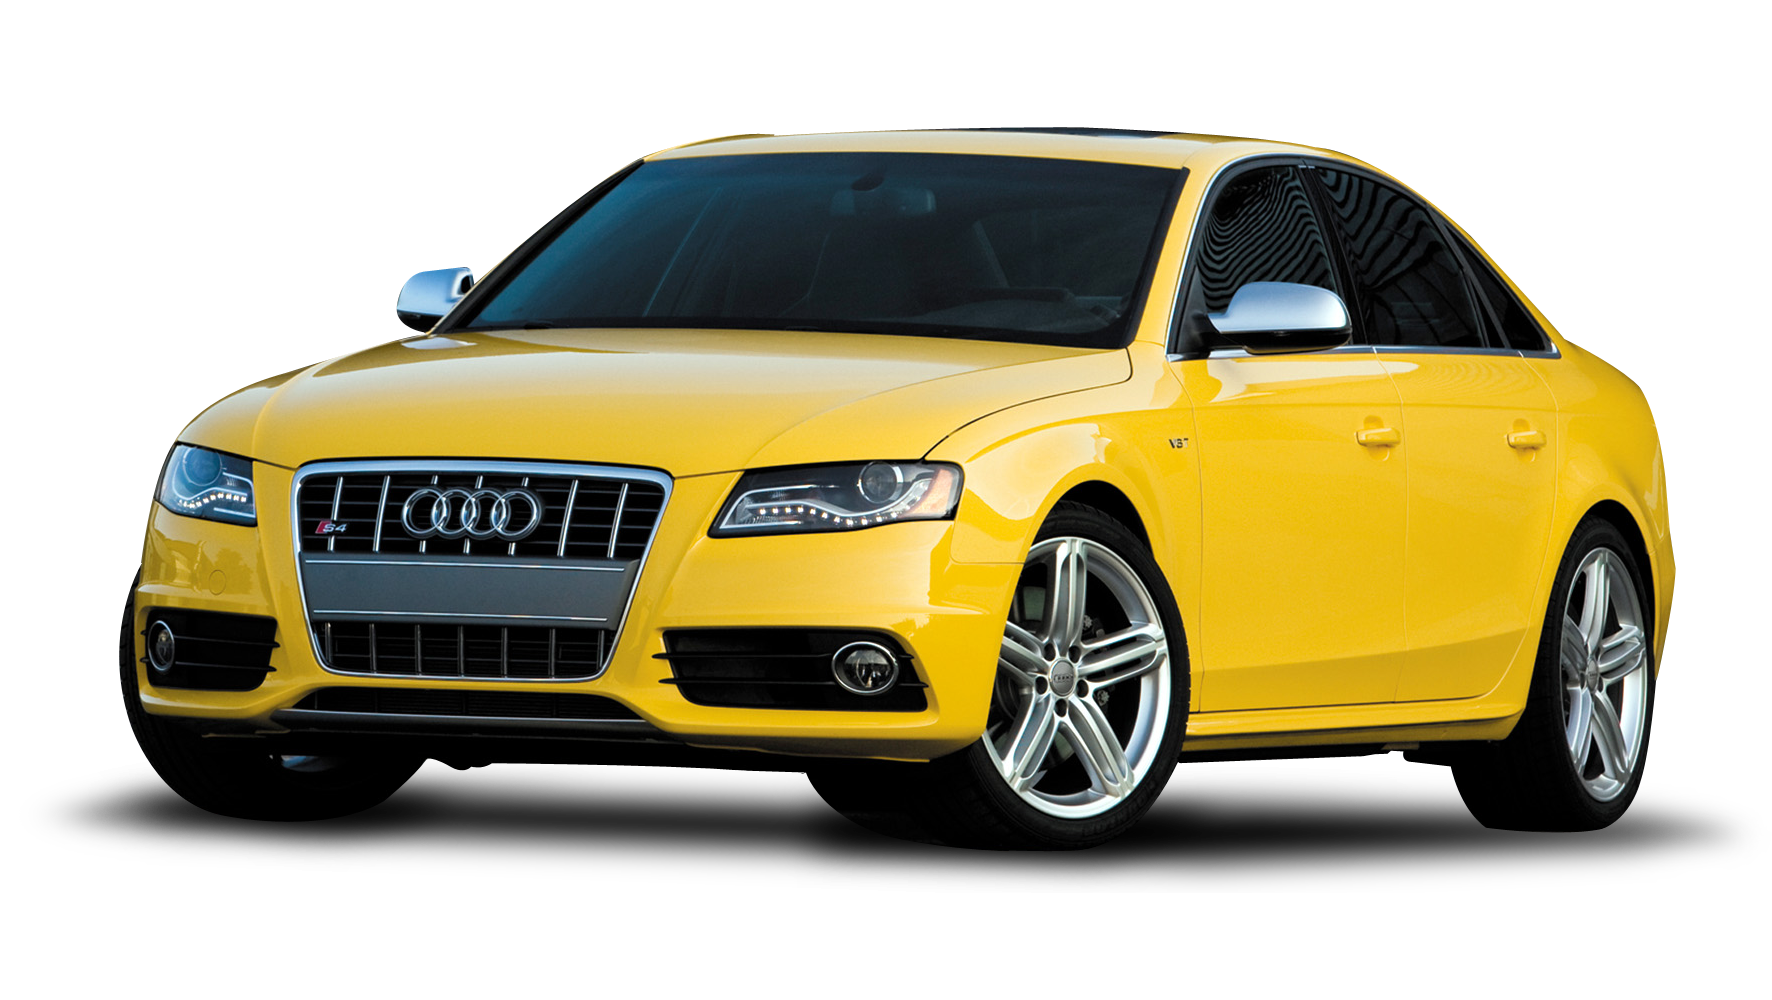 Yellow Audi Car PNG Hd